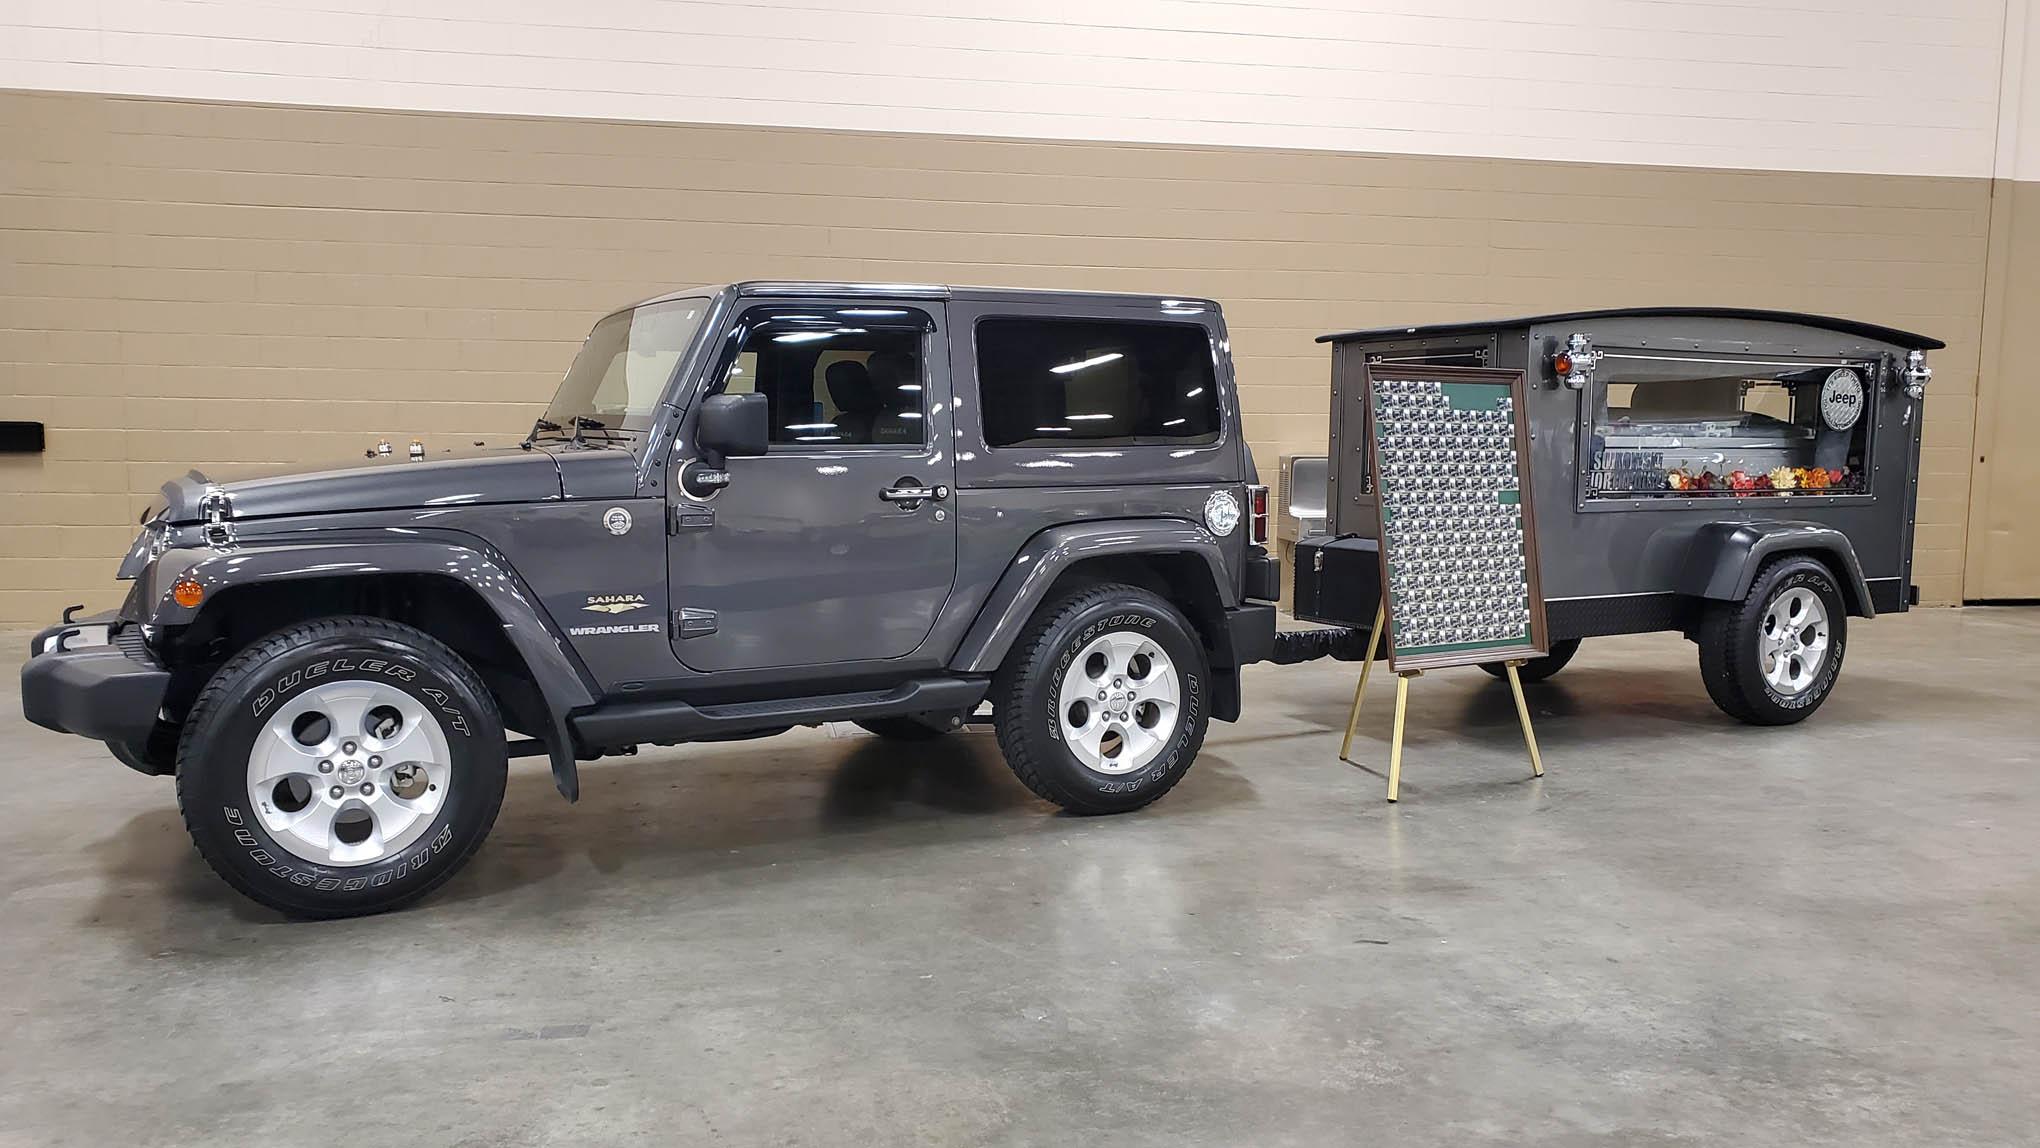 053 toledo jeep fest gallery